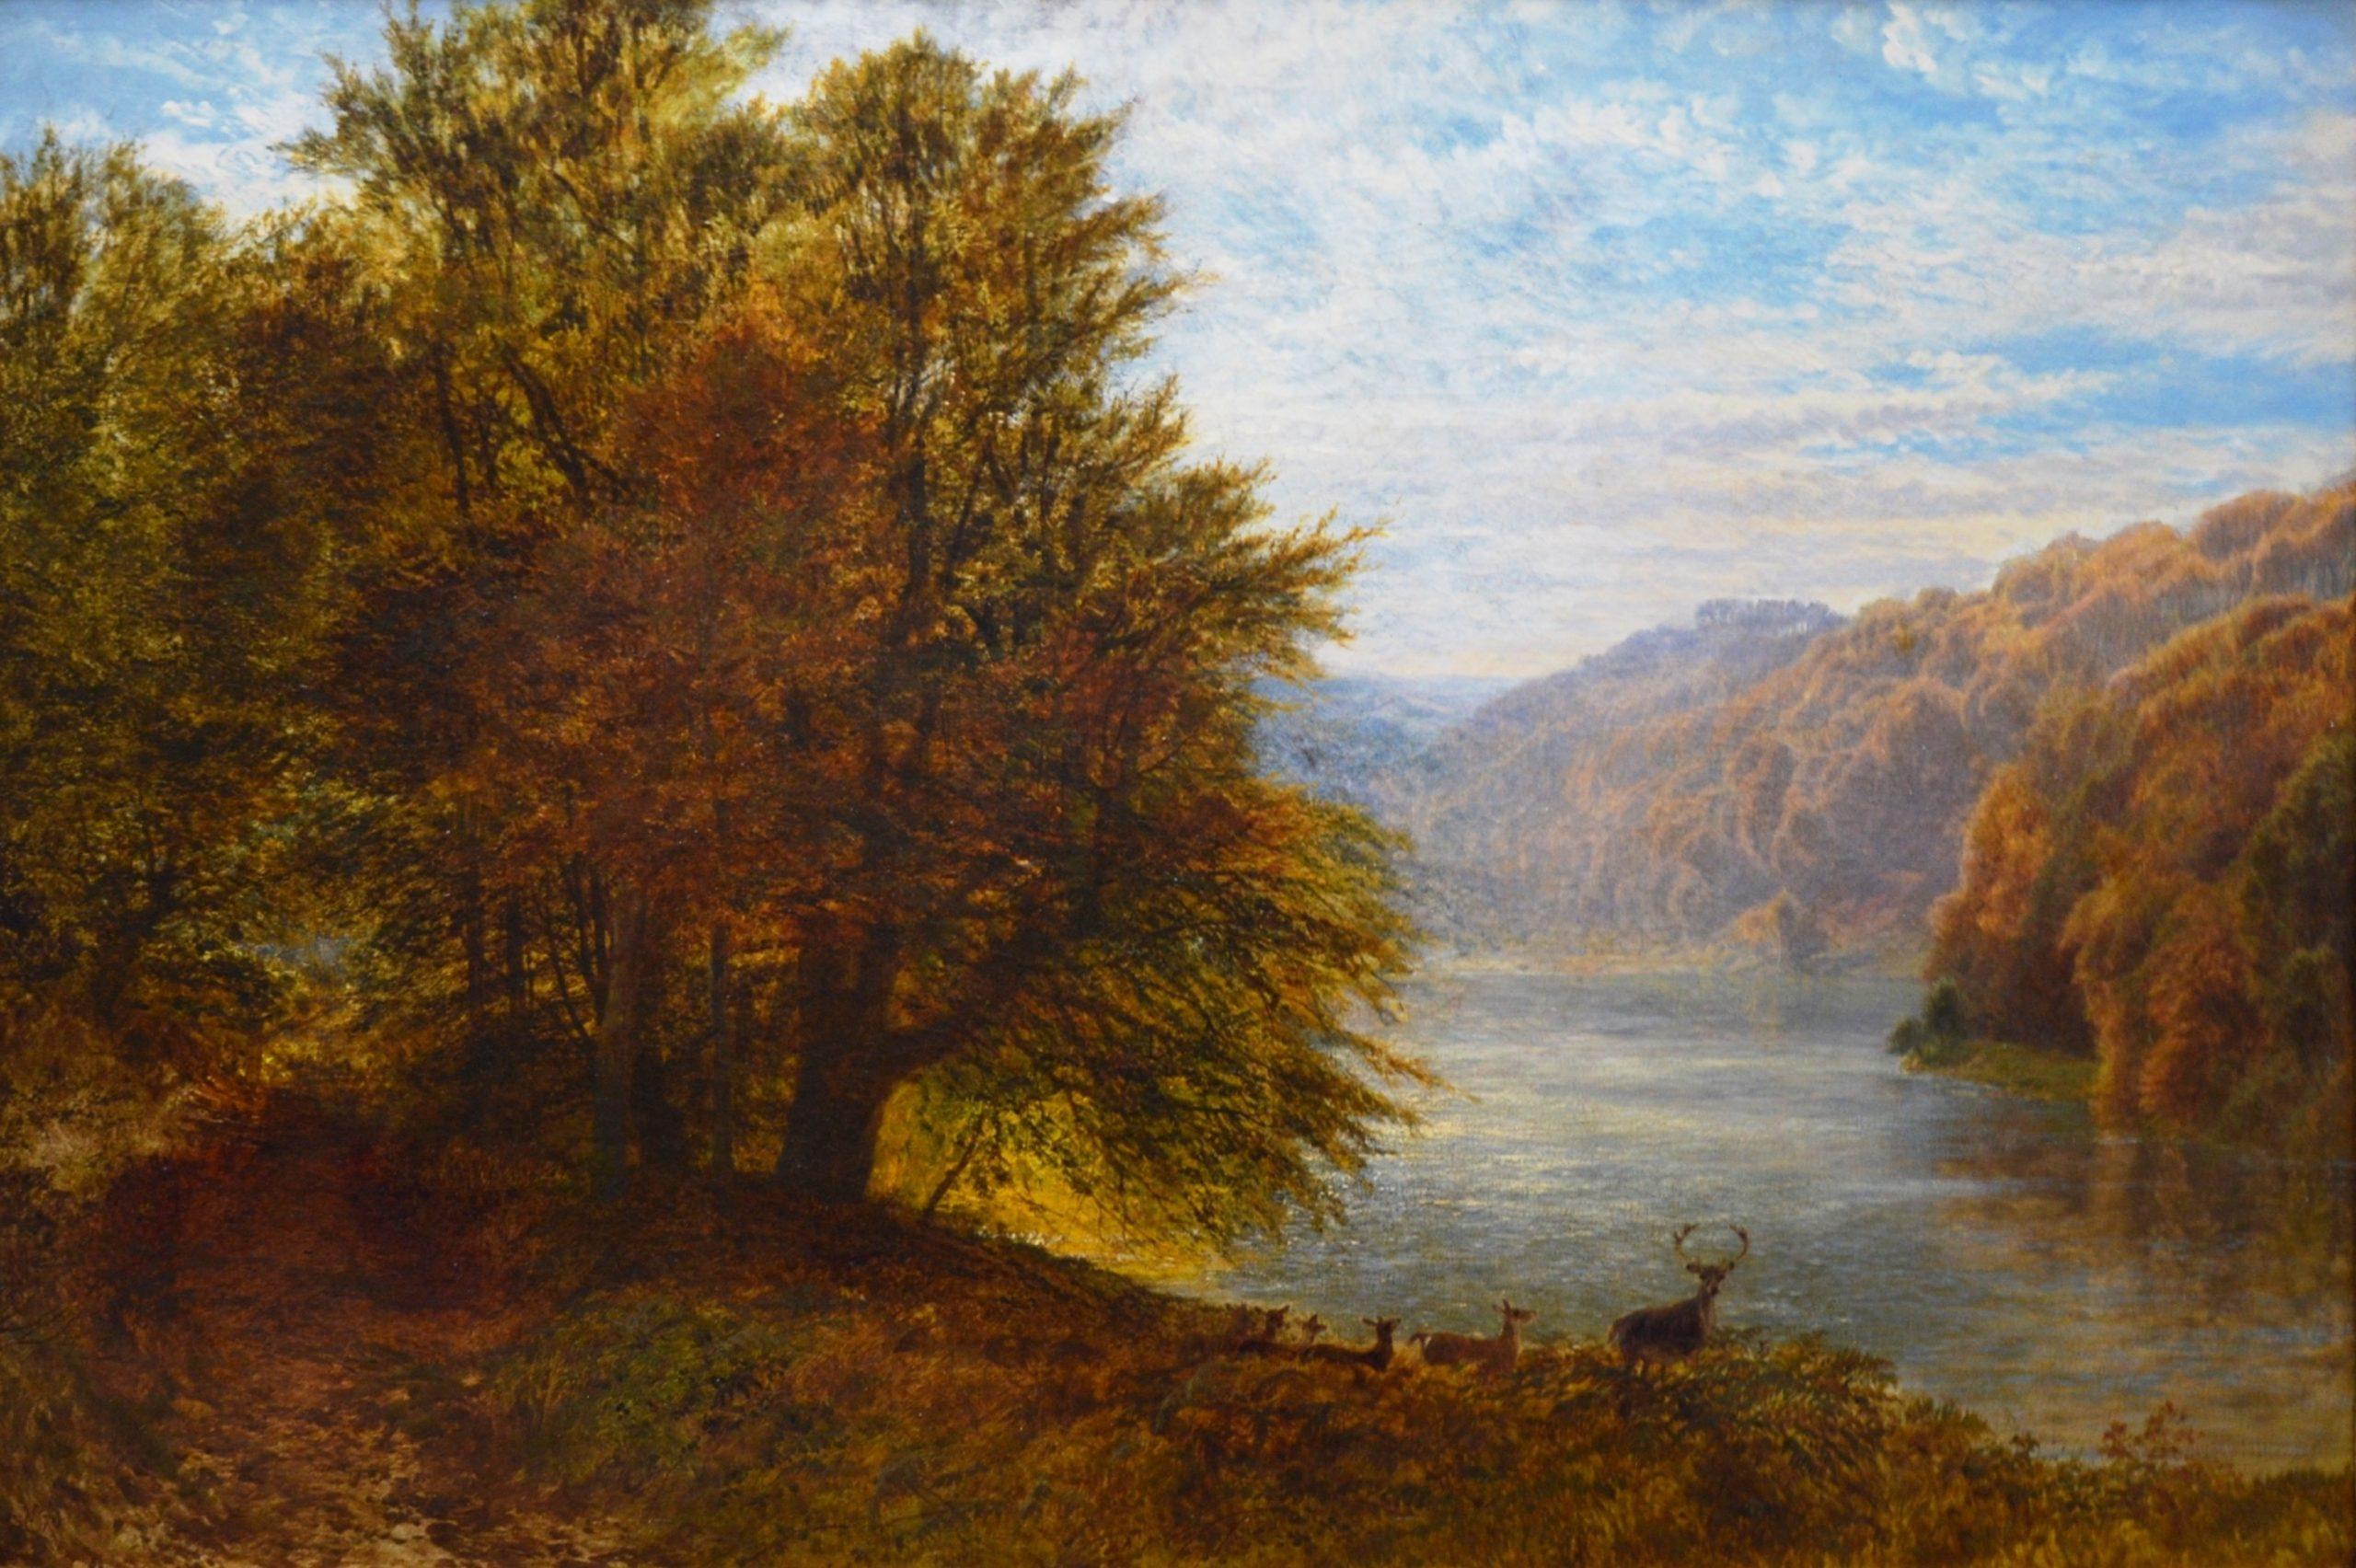 Sunshine Showers - 19th Century English Landscape Oil Painting Image